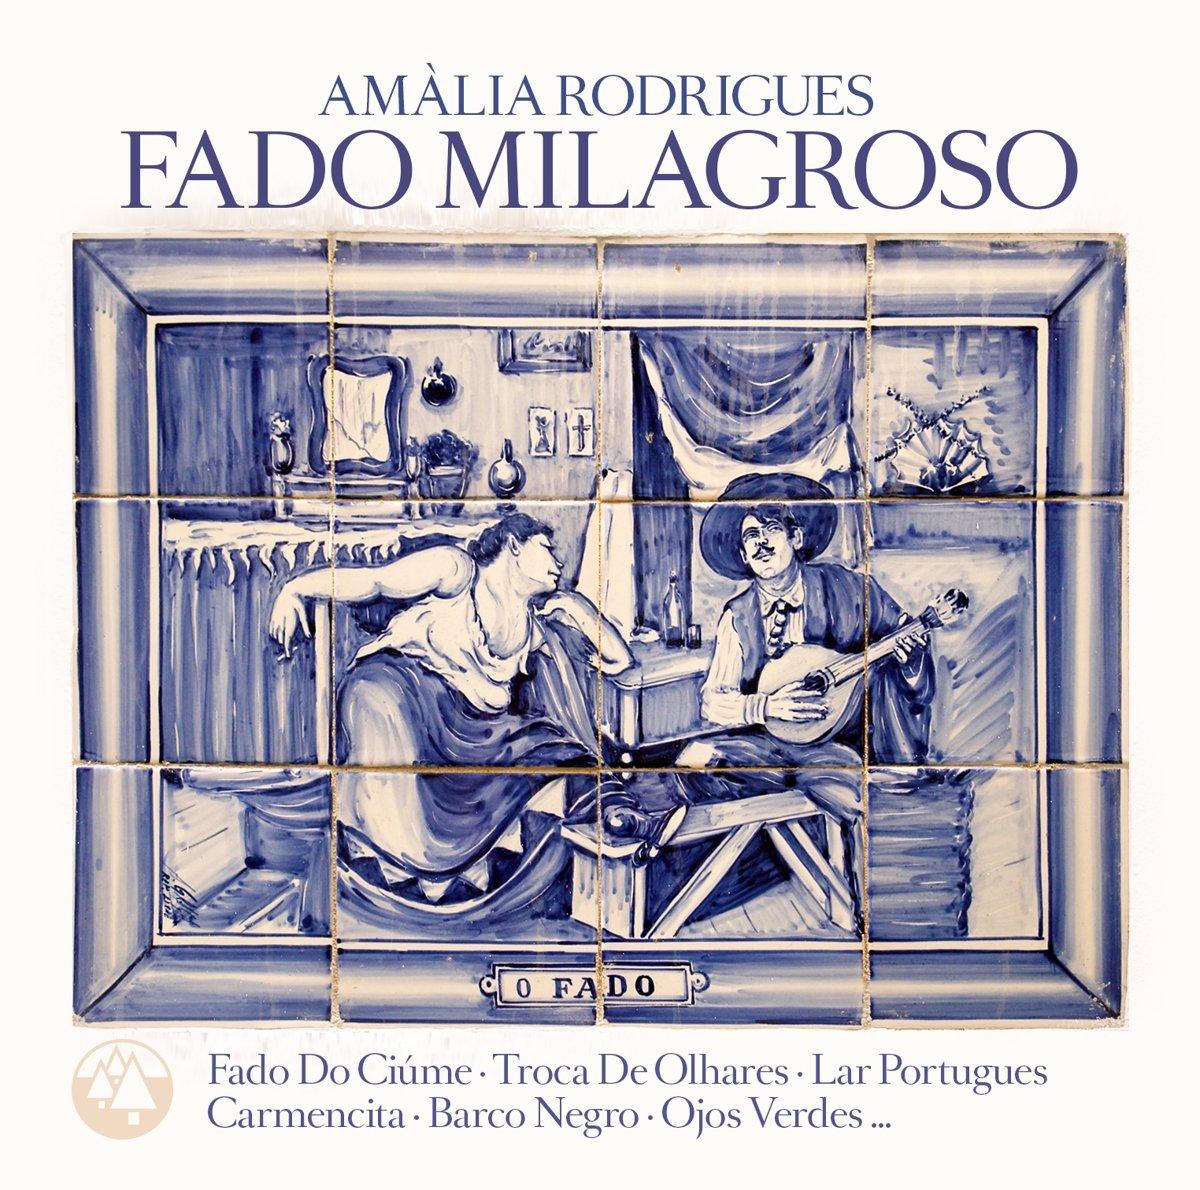 Амалиа Родригес Amalia Rodrigues. Fado Milagroso (2 CD) adele fado палантин